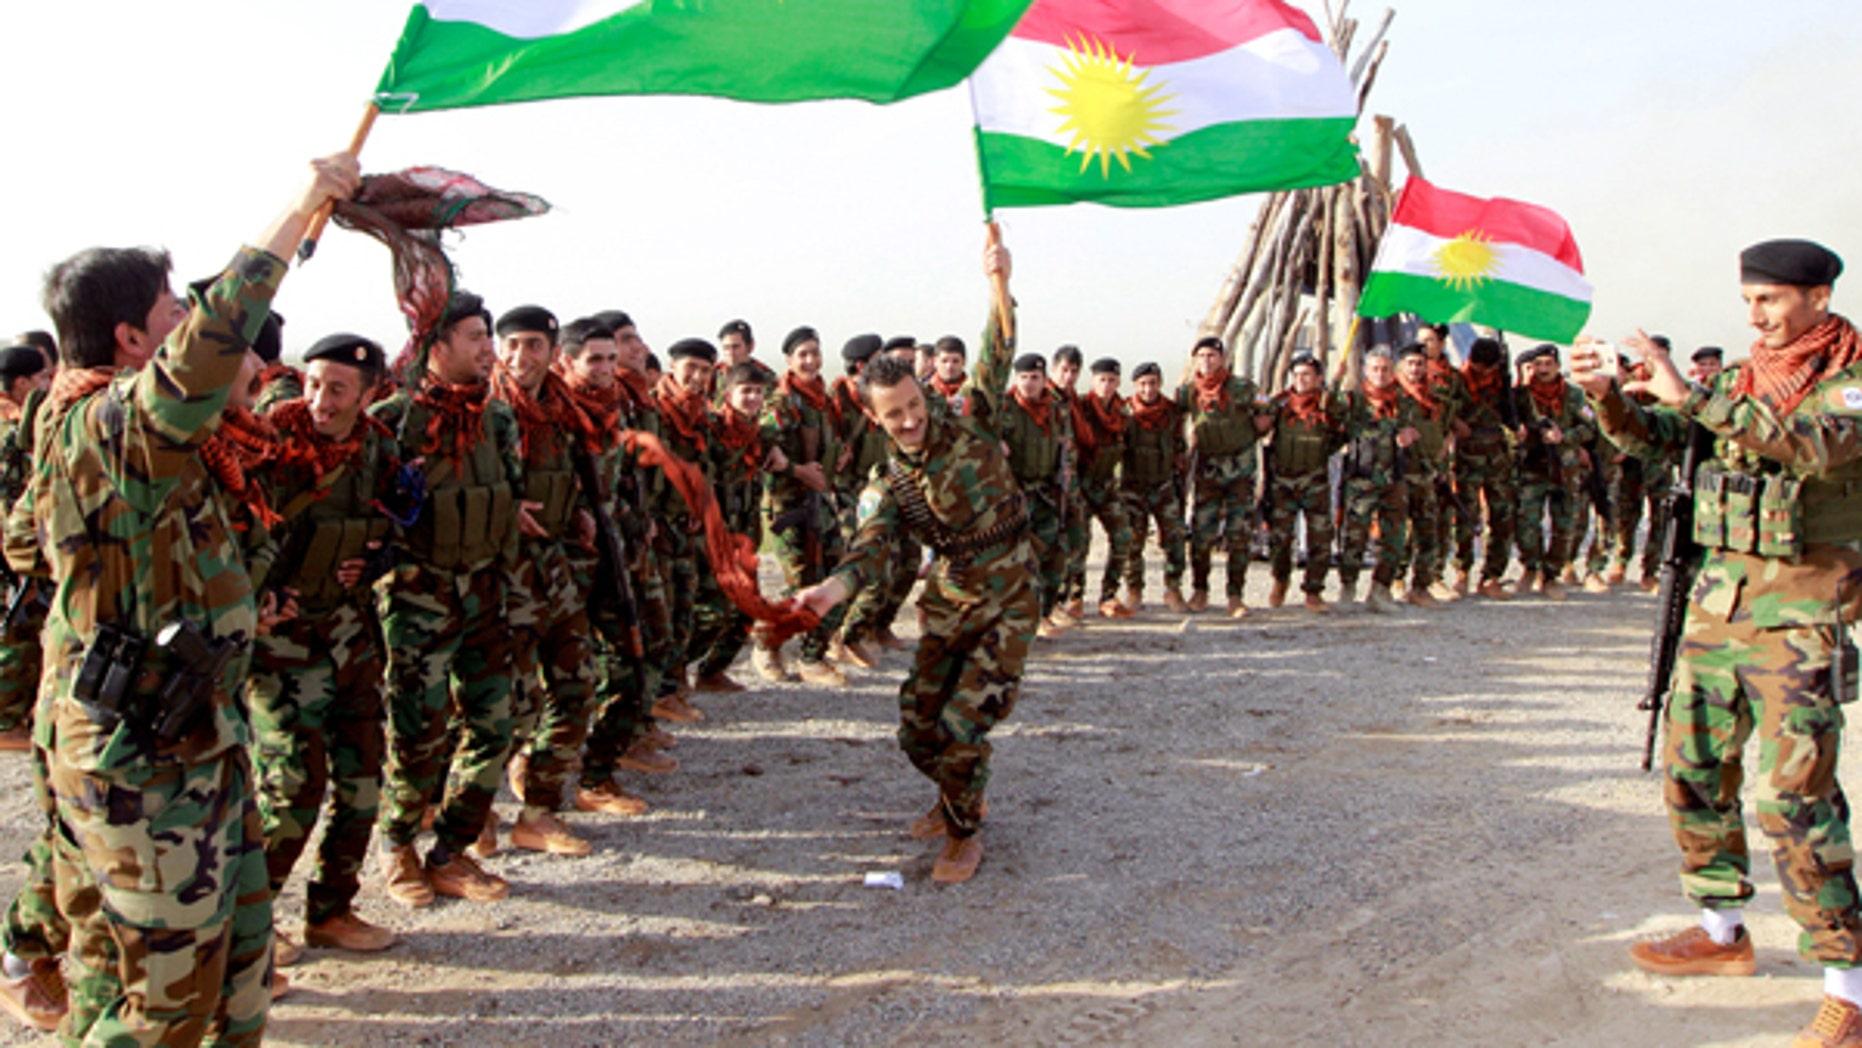 March 20, 2017: Kurdish Peshmerga forces celebrate Newroz Day, a festival marking spring and the new year, in Kirkuk.